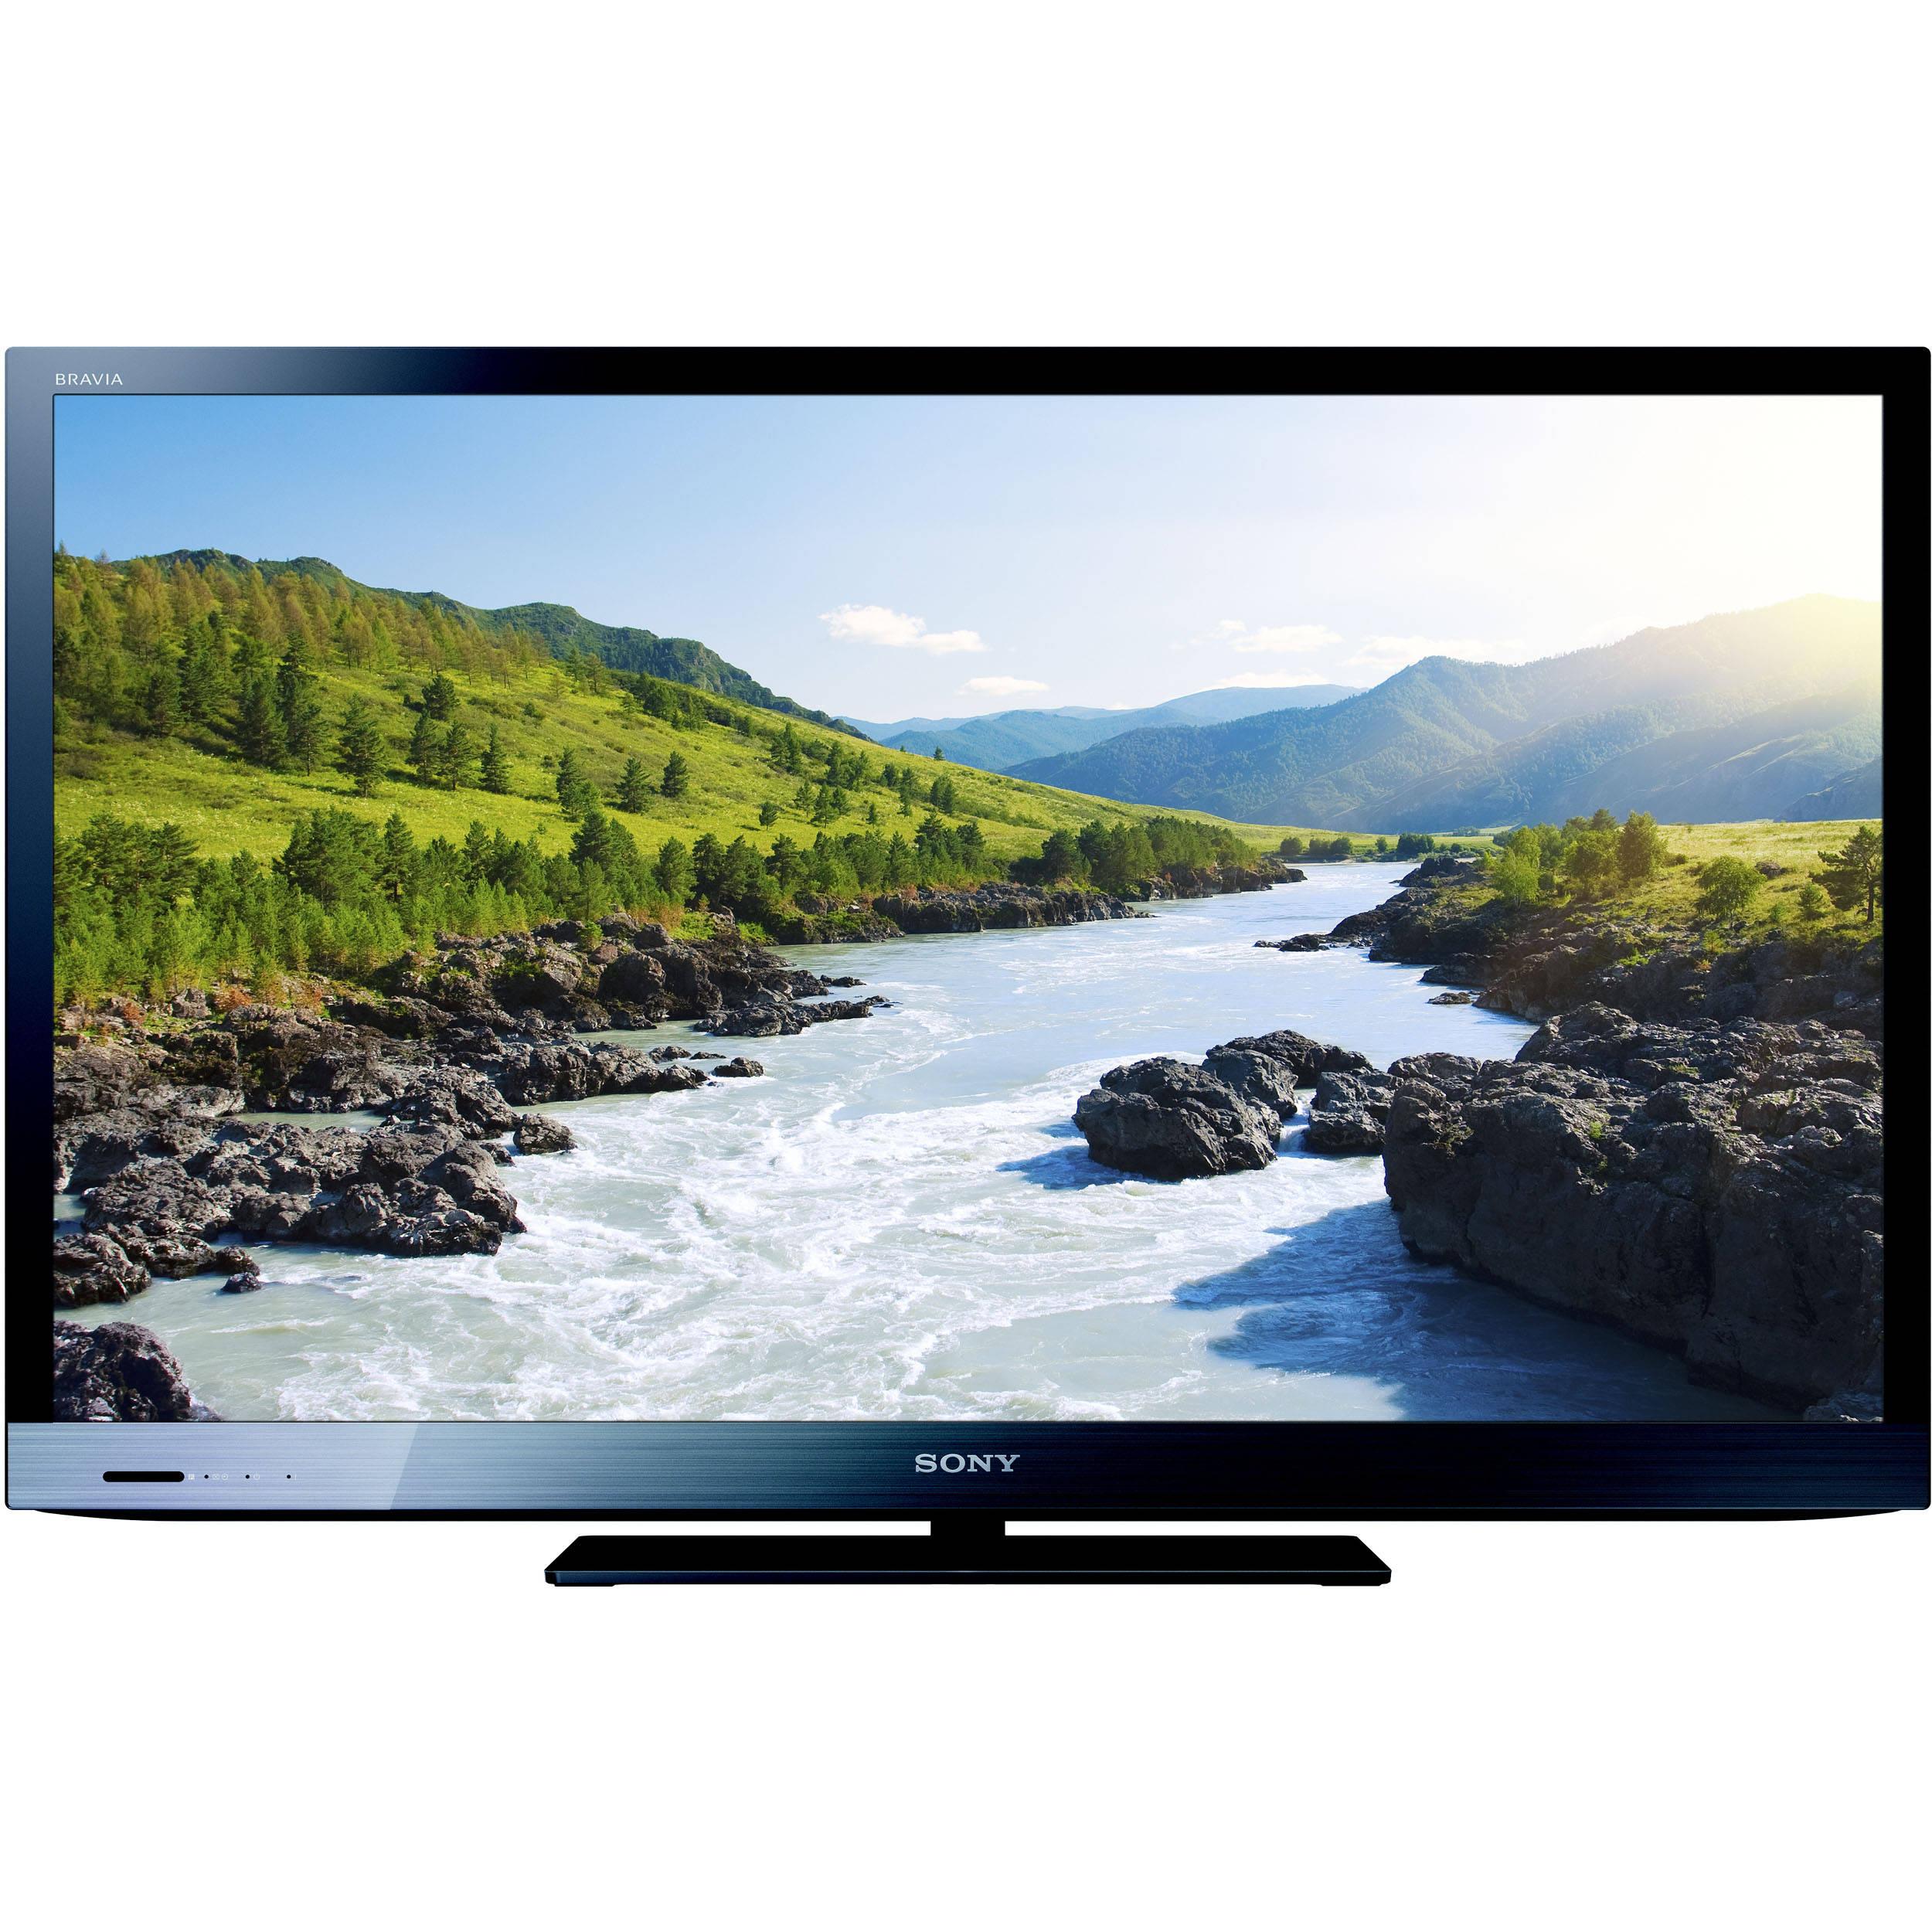 Drivers: Sony BRAVIA KDL-46CX520 HDTV